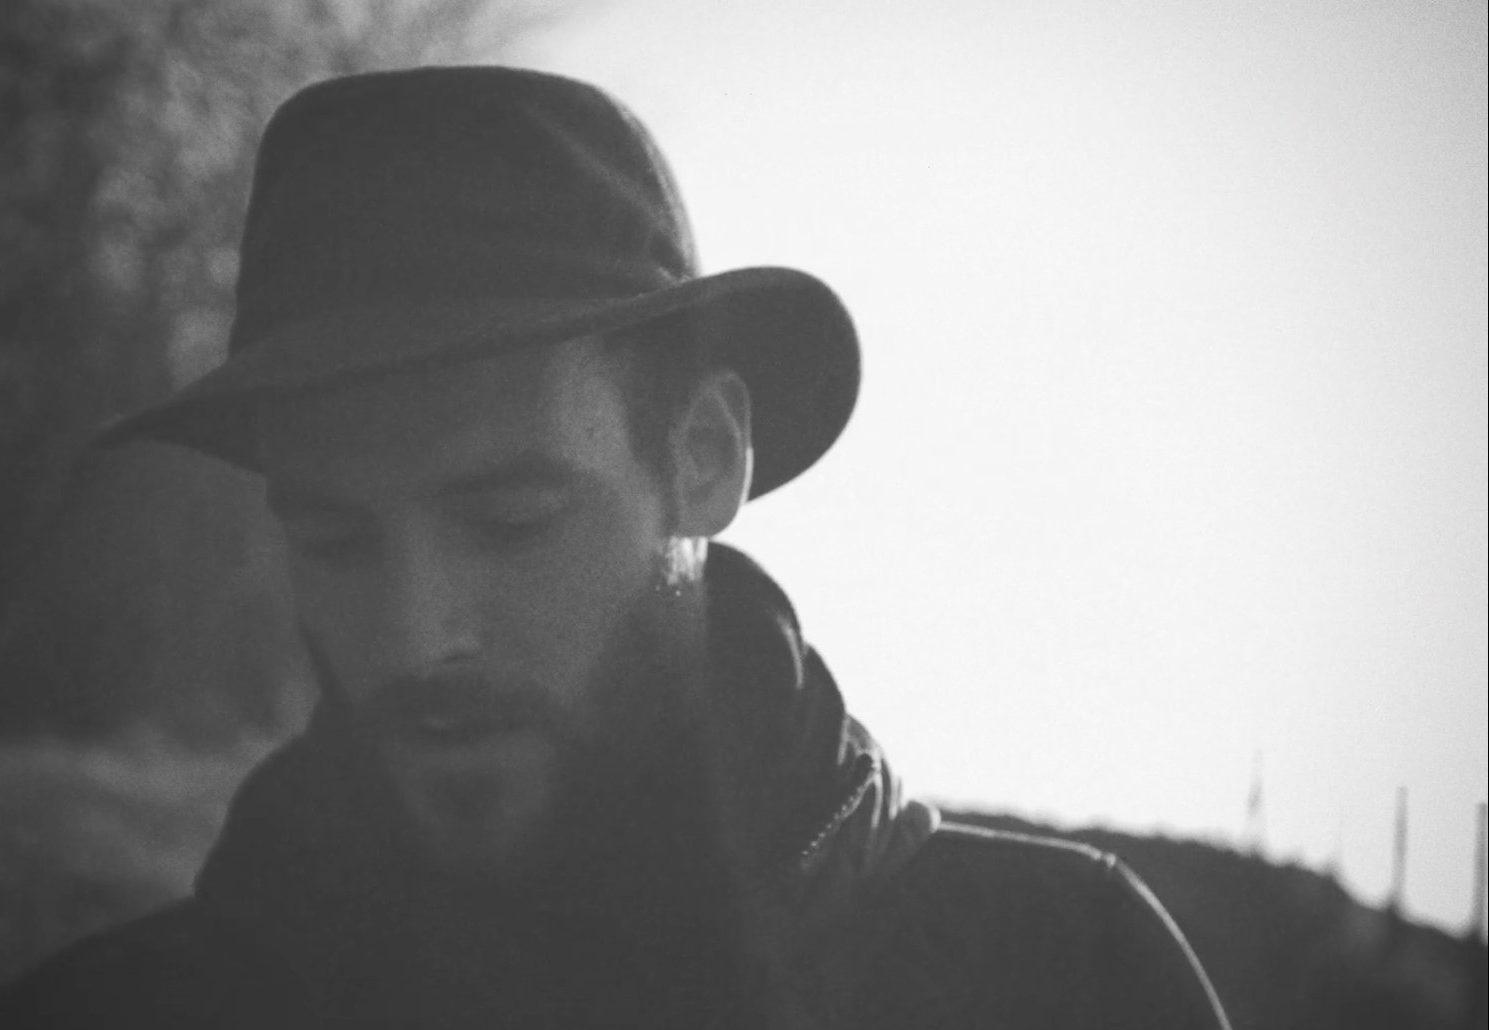 new music alert-my narrow road-by-roo panes-UK-indie music-new music-indie folk-music blog-indie blog-wolf in a suit-wolfinasuit-wolf in a suit blog-wolf in a suit music blog